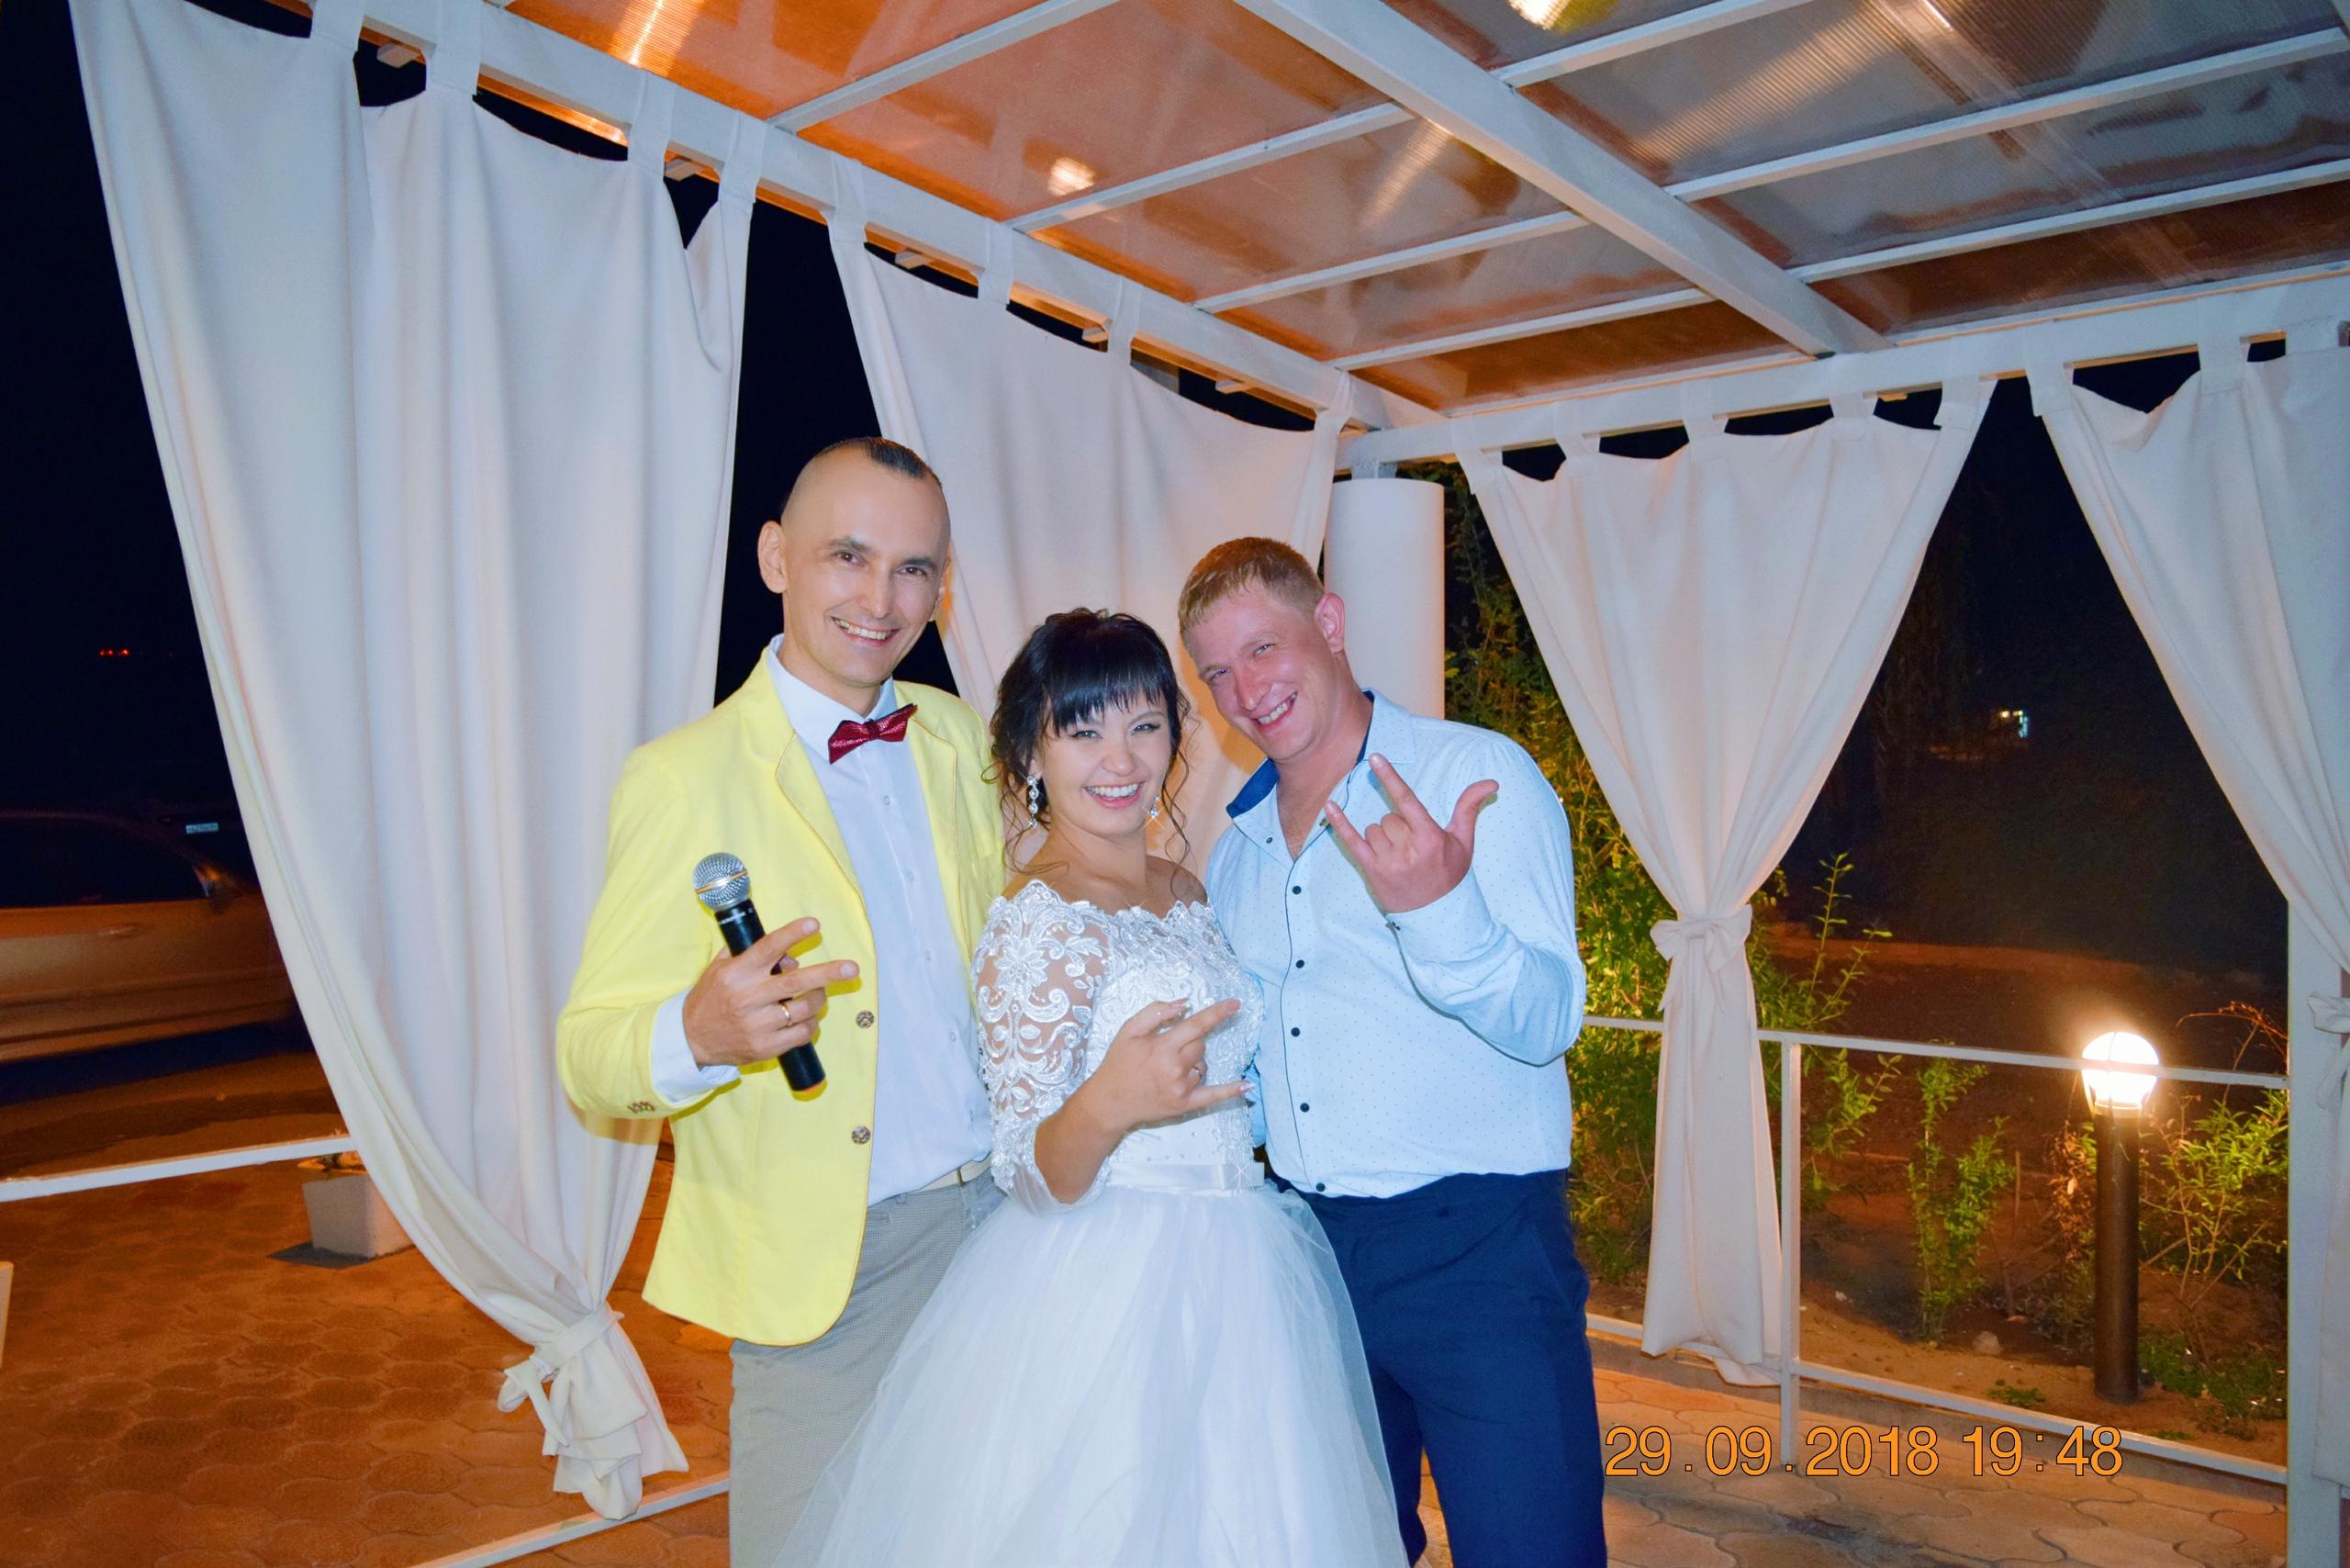 SHW7dF26U88 - Свадьба Дениса и Галии